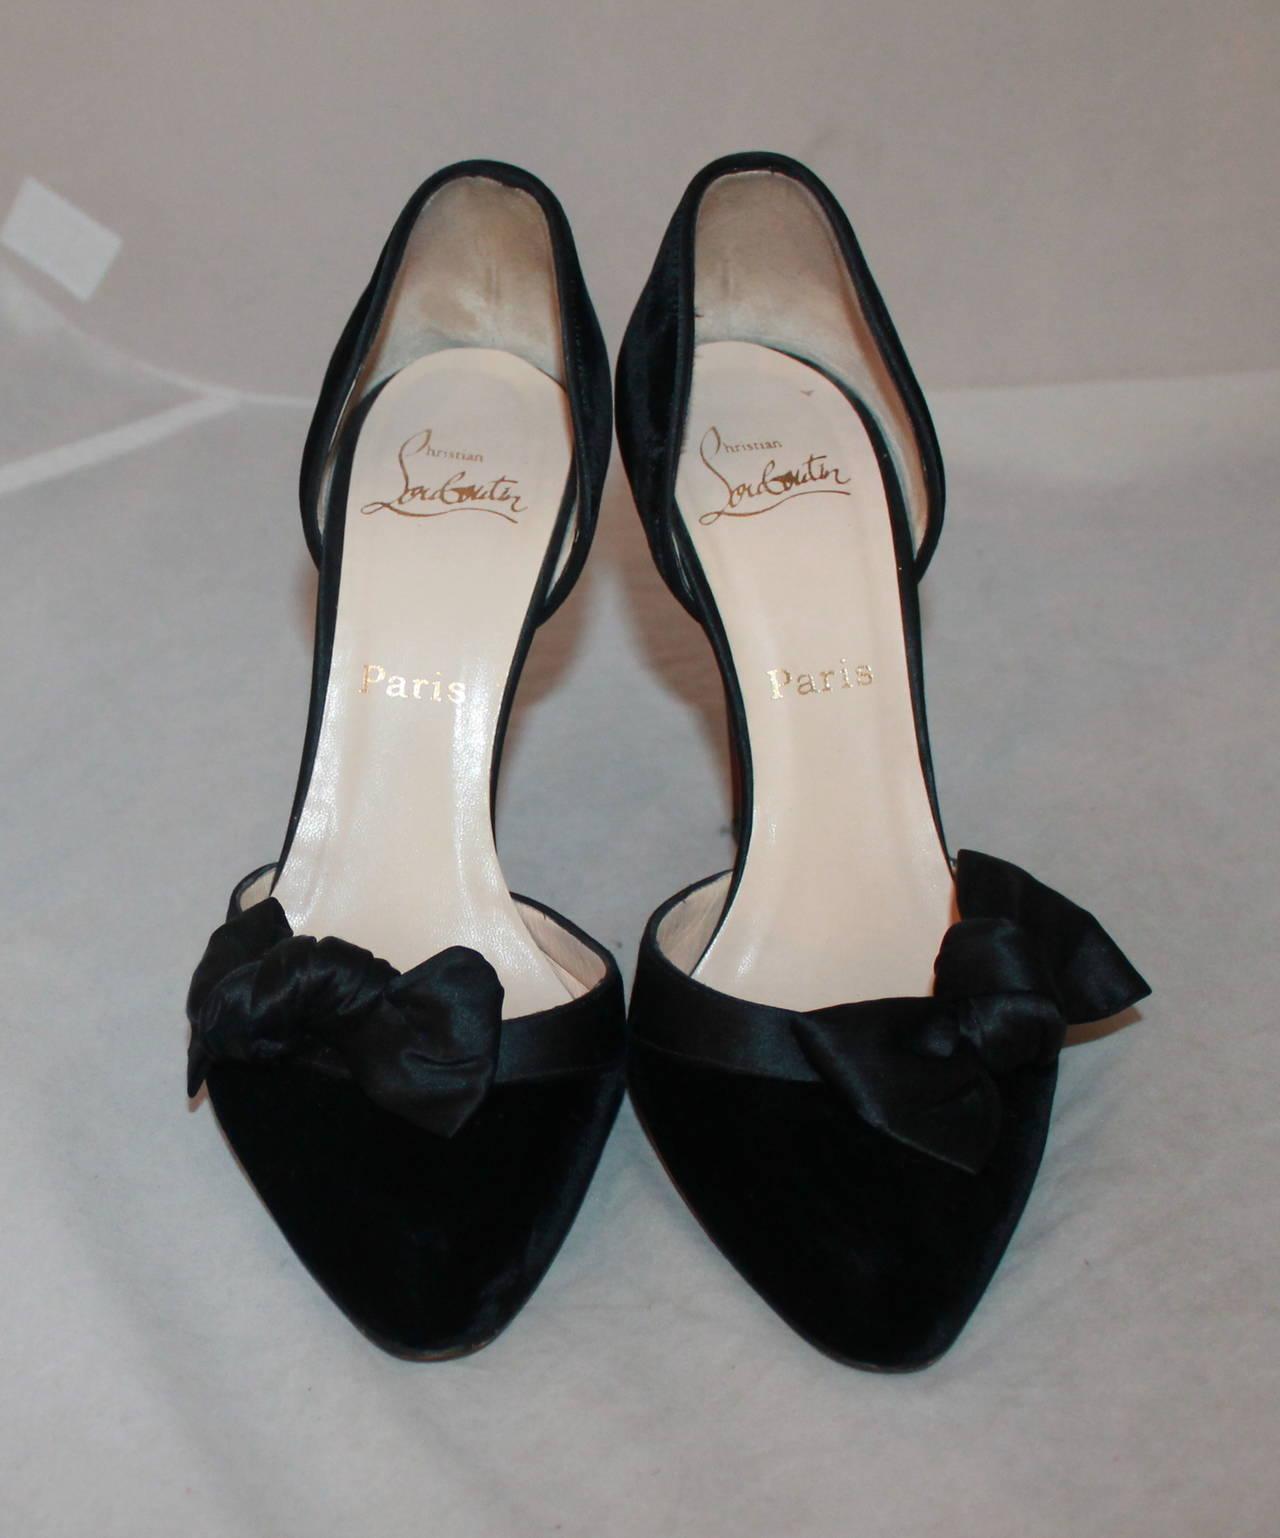 best replica christian louboutins - Christian Louboutin Black Velvet and Satin Bow Heels - 39 For Sale ...